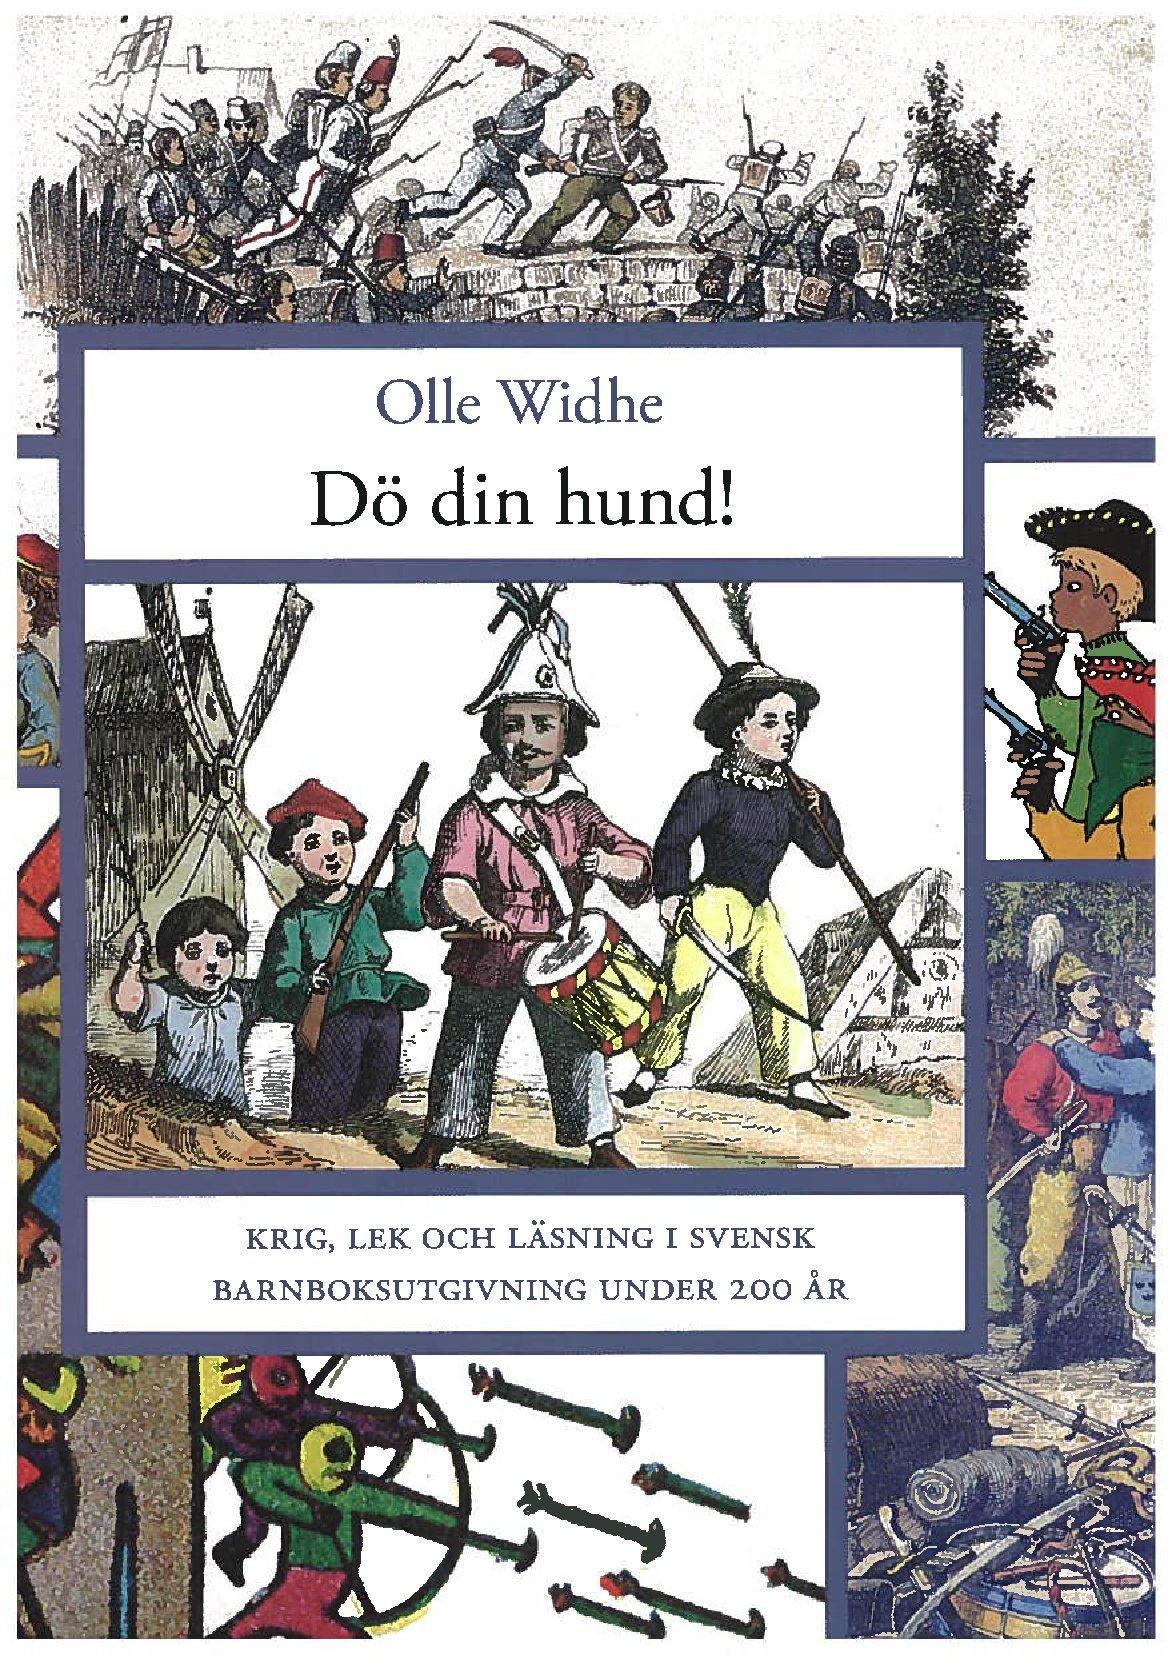 Dö din hund! Krig, lek og läsning i svensk barnebokutgivning under 200 år.